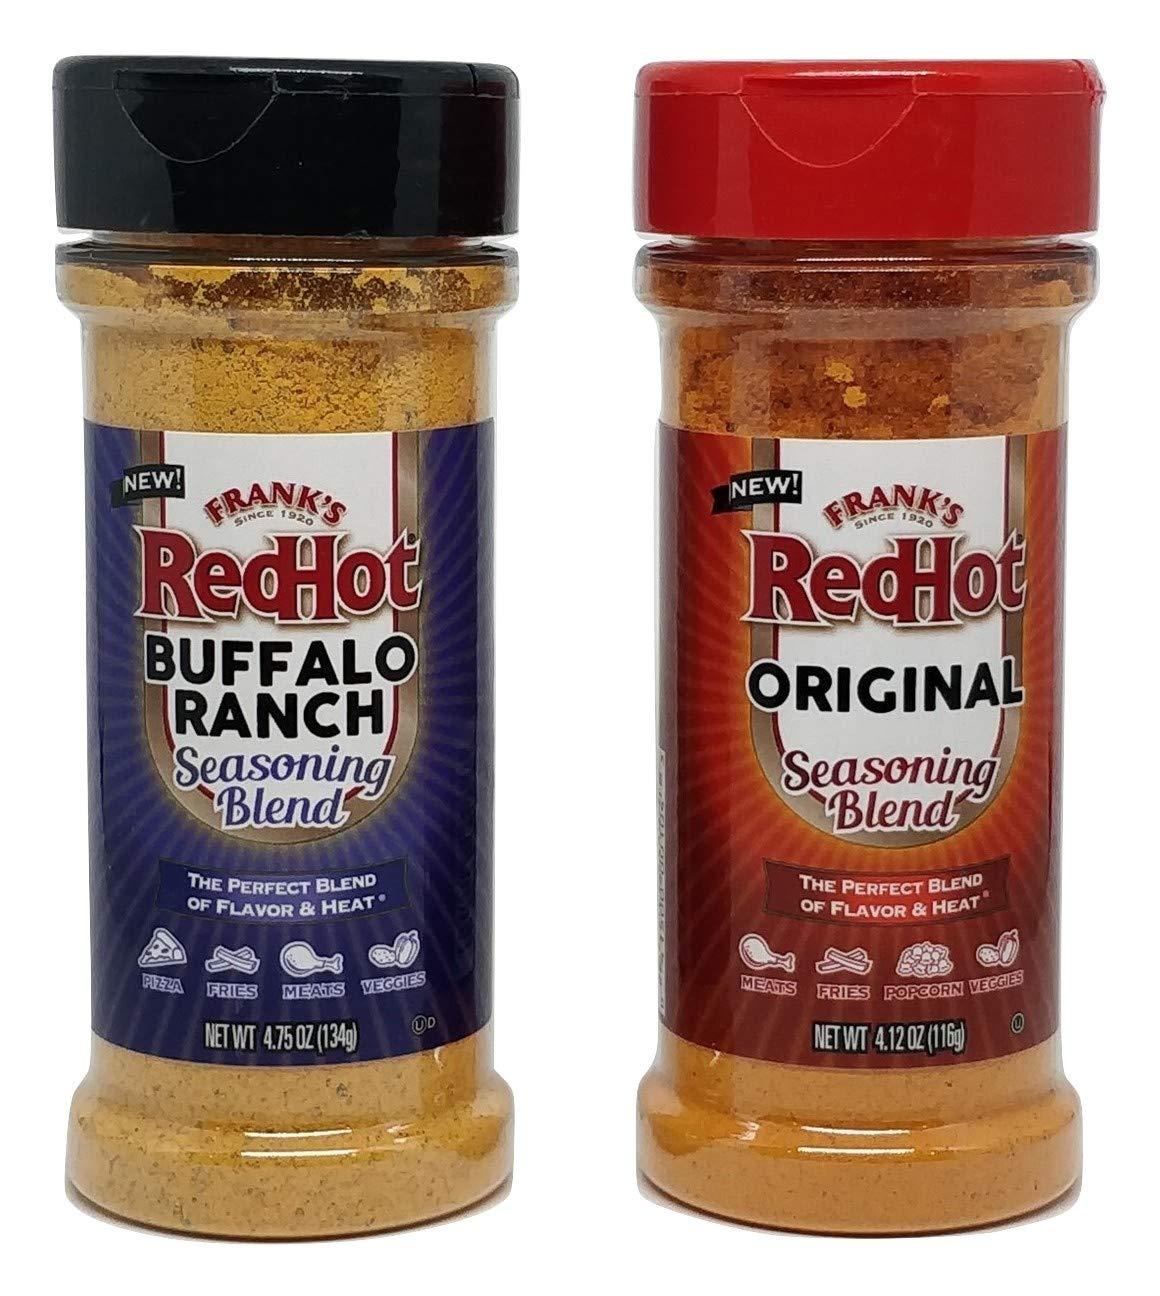 Frank's RedHot Seasoning Set: Frank's RedHot Original and Buffalo Ranch - Set of 2 Frank's RedHot Seasoning Blends